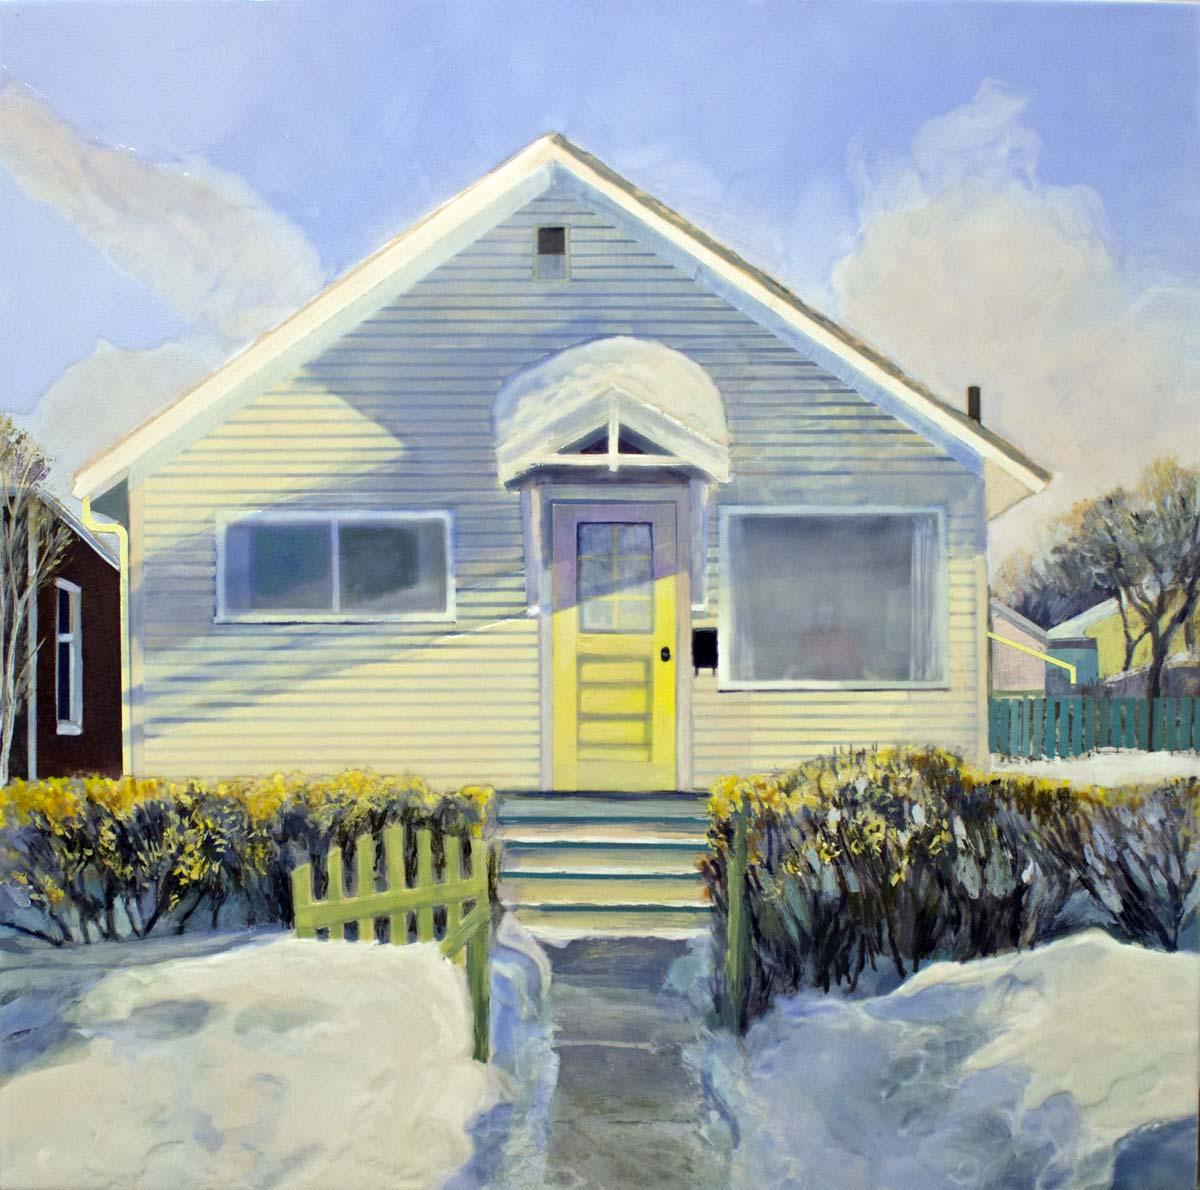 QSCP-Lilys-House-Acrylic-Panel-20-x-20-2016-web.jpg